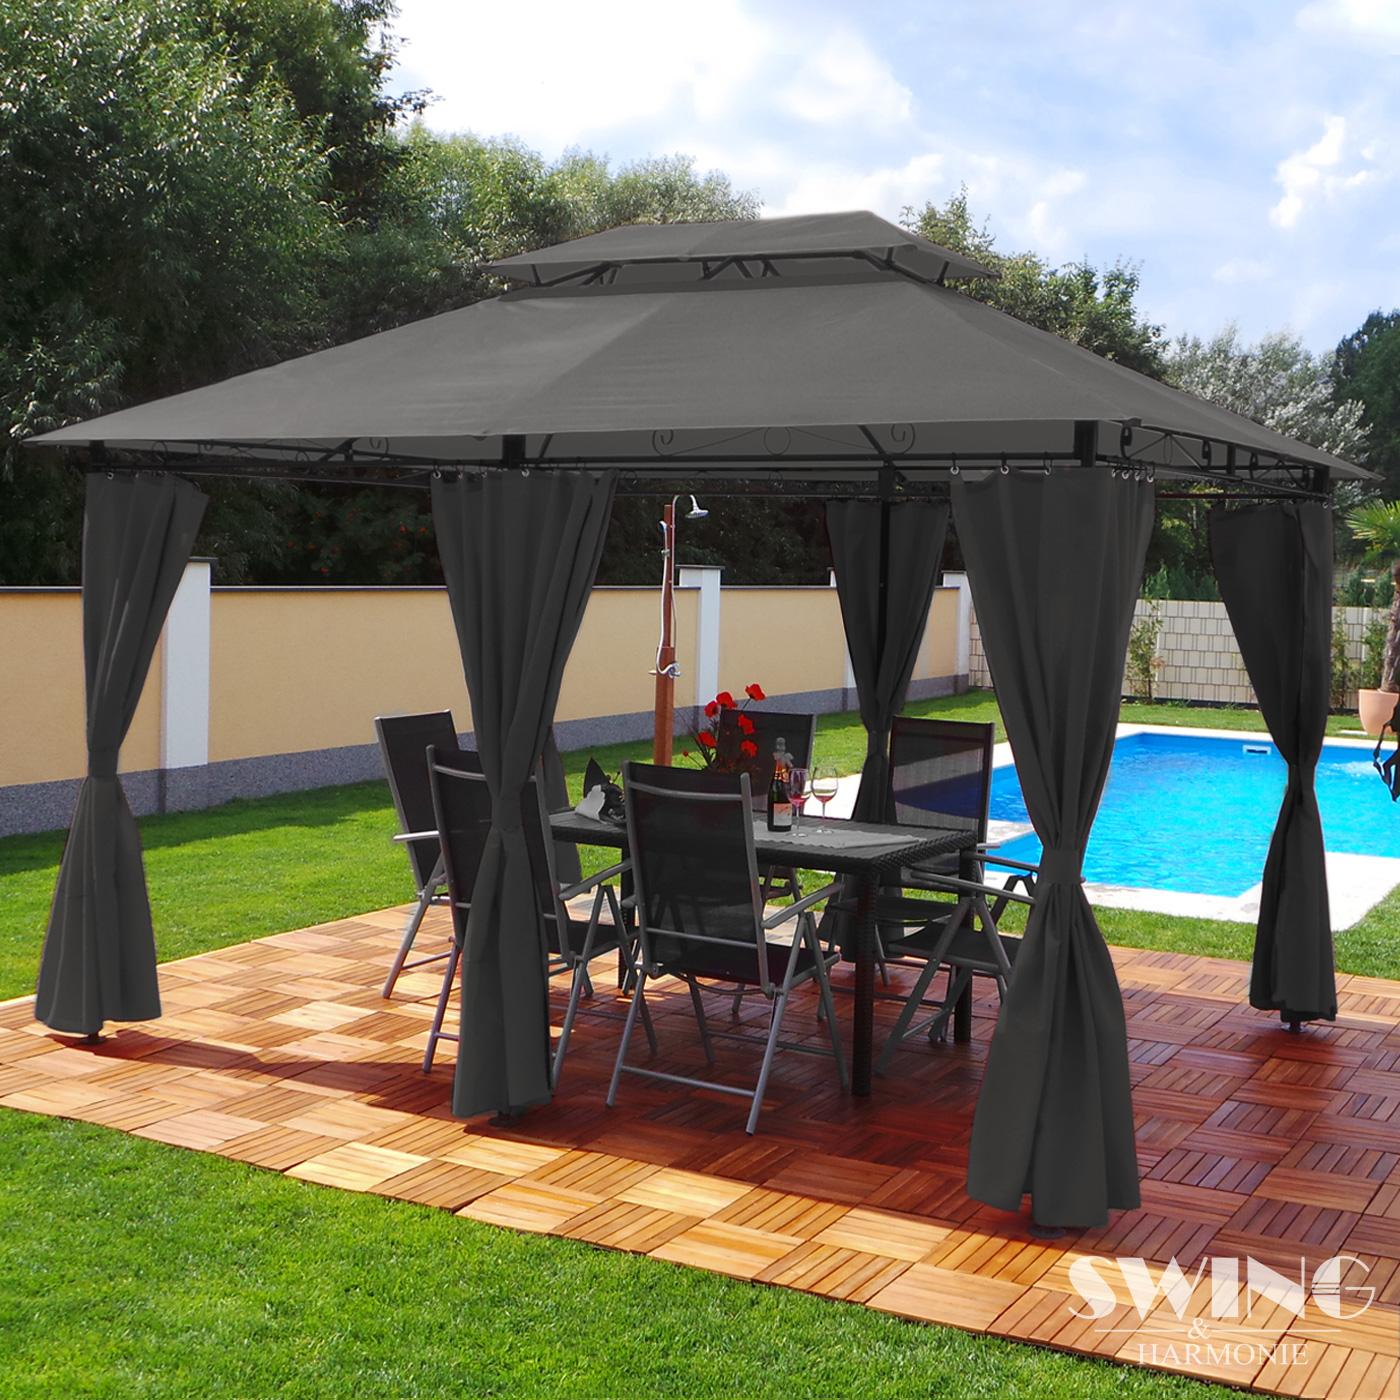 3x4 m gazebo<br> garden tent<br> pavilion garden ...